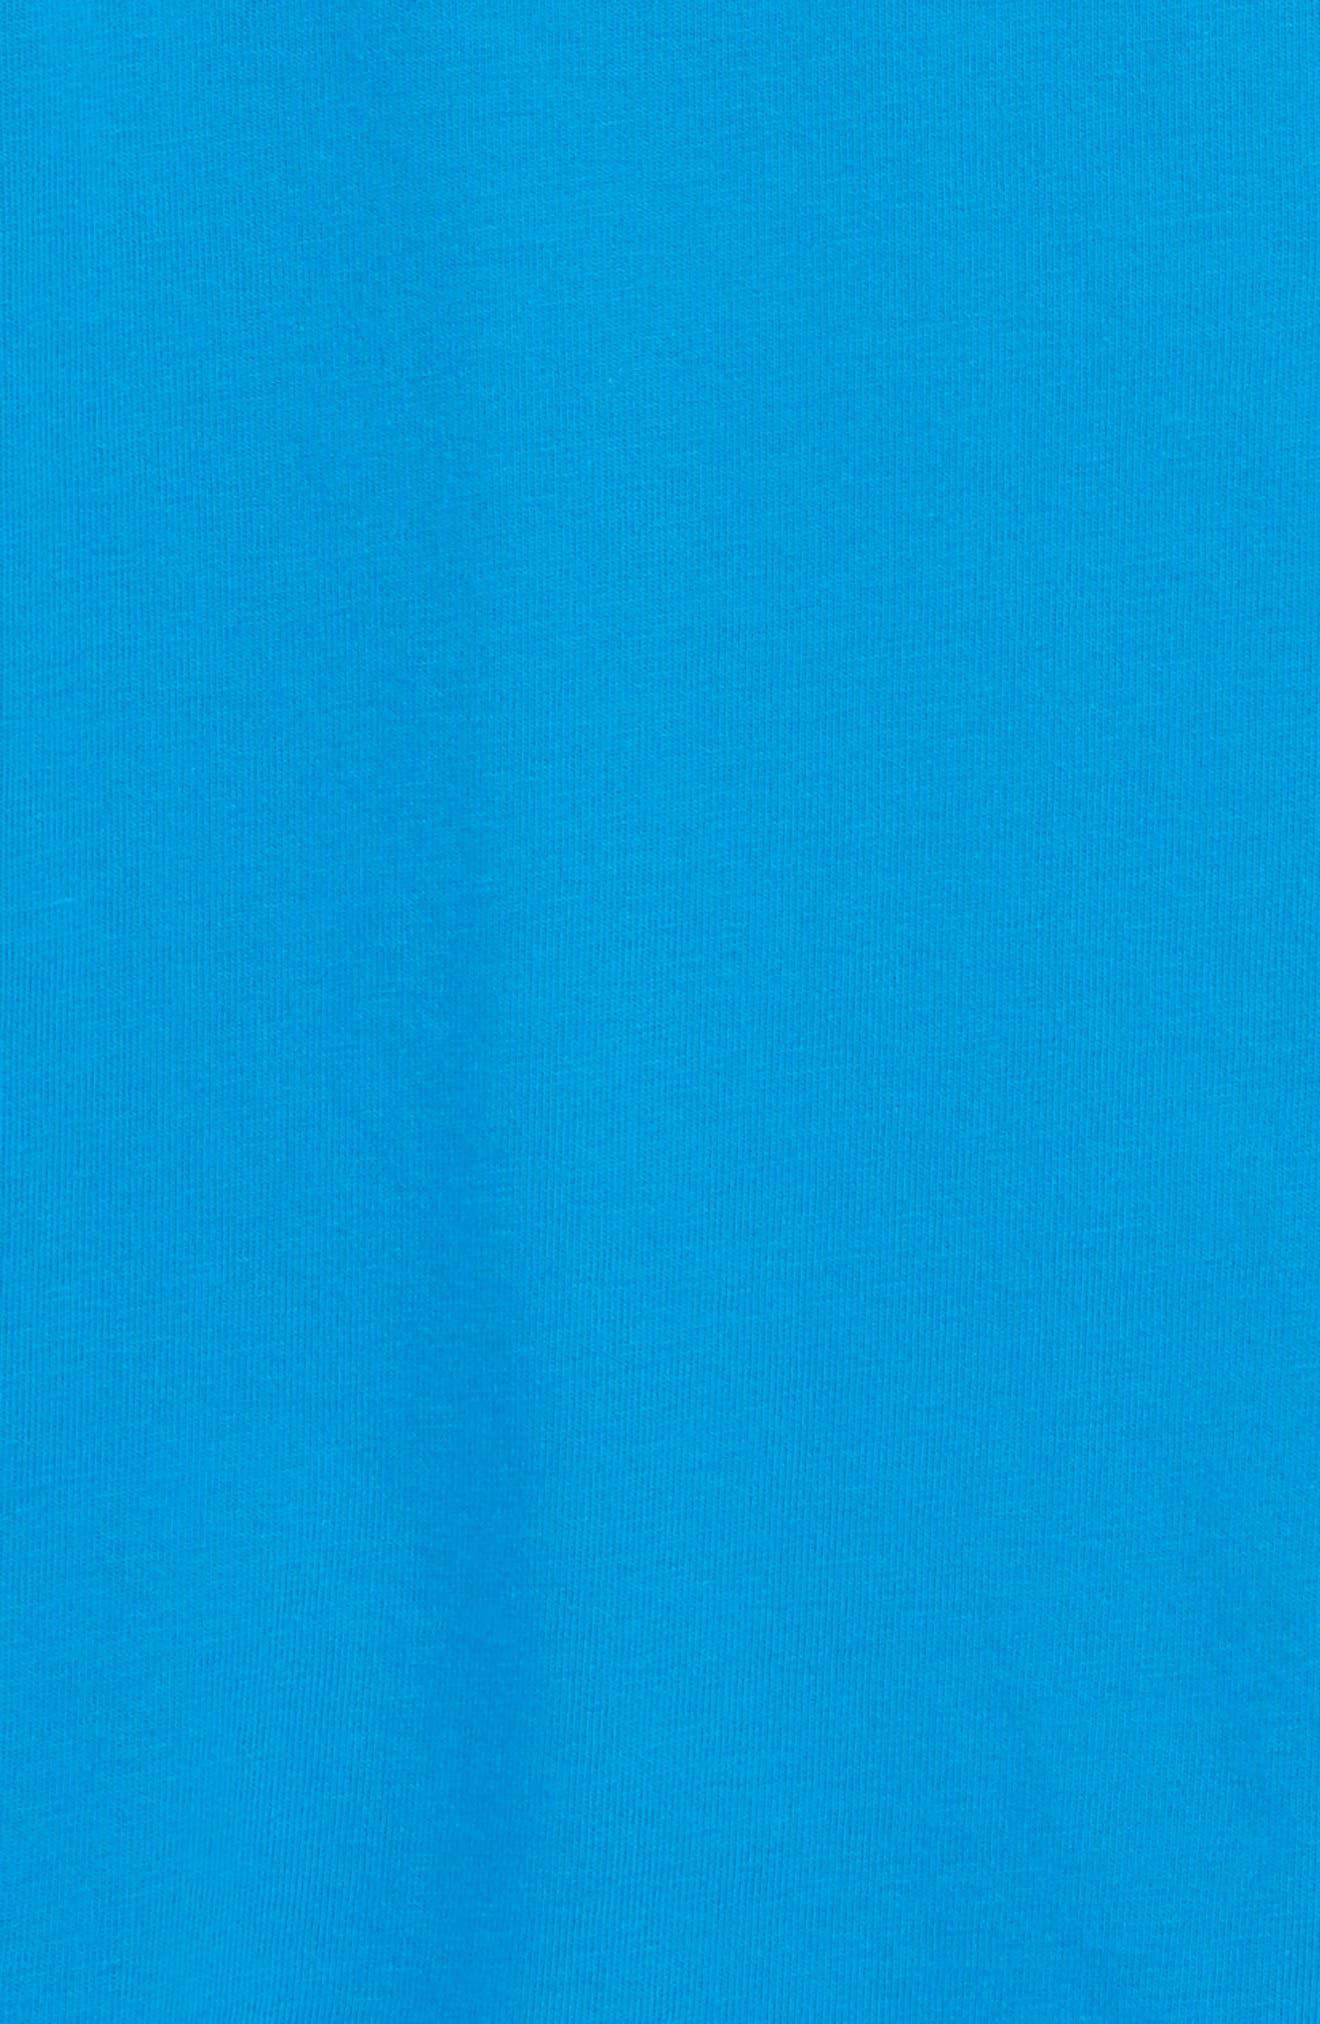 Alternate Image 3  - Vineyard Vines 'Vintage Whale' Pocket T-Shirt (Toddler Boys & Little Boys)